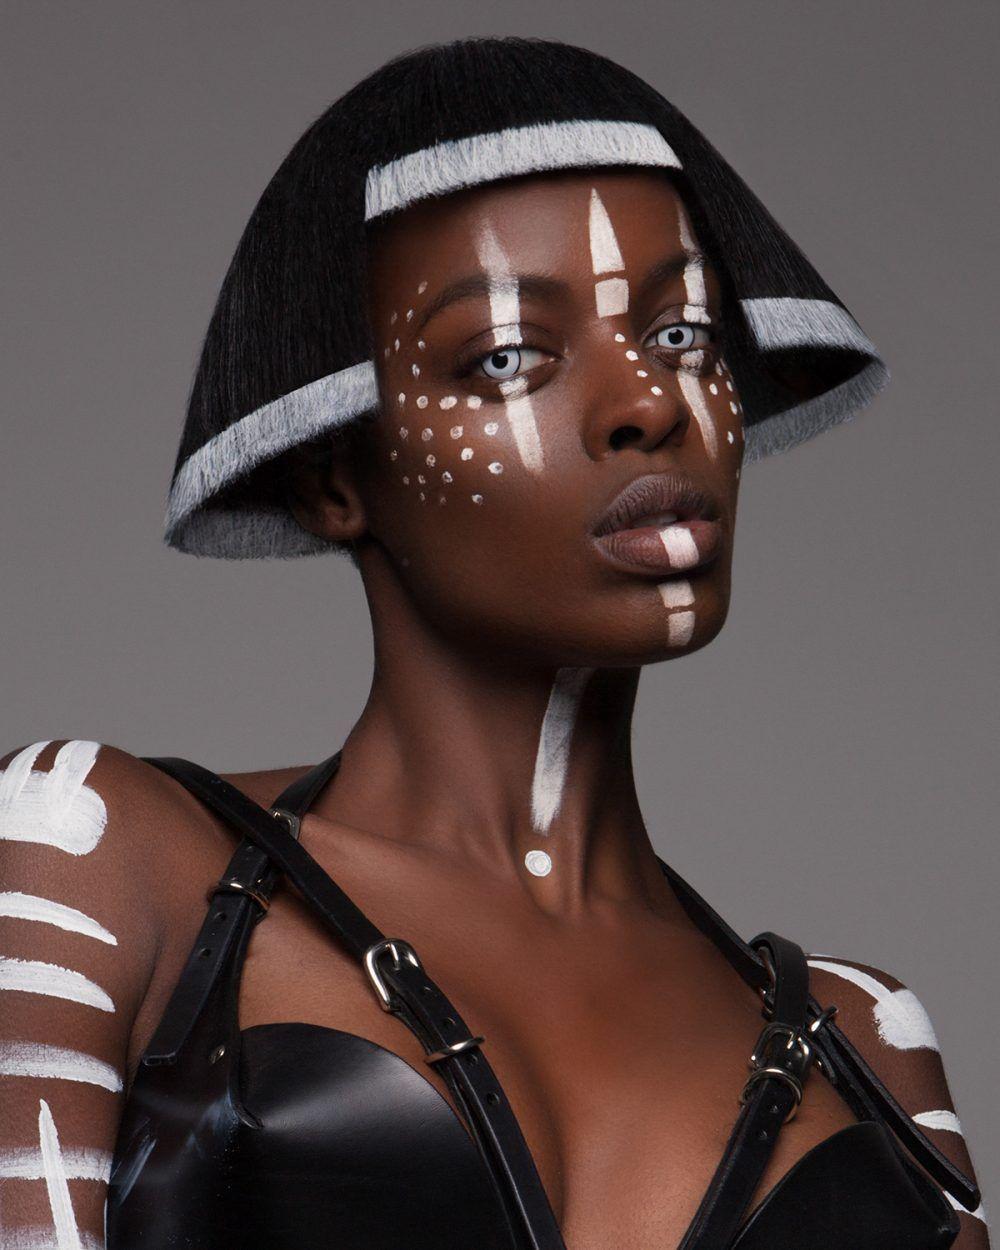 Behance, https://www.behance.net/gallery/45128323/British-Hair-Awards-2016-Afro-Finalist-Collection